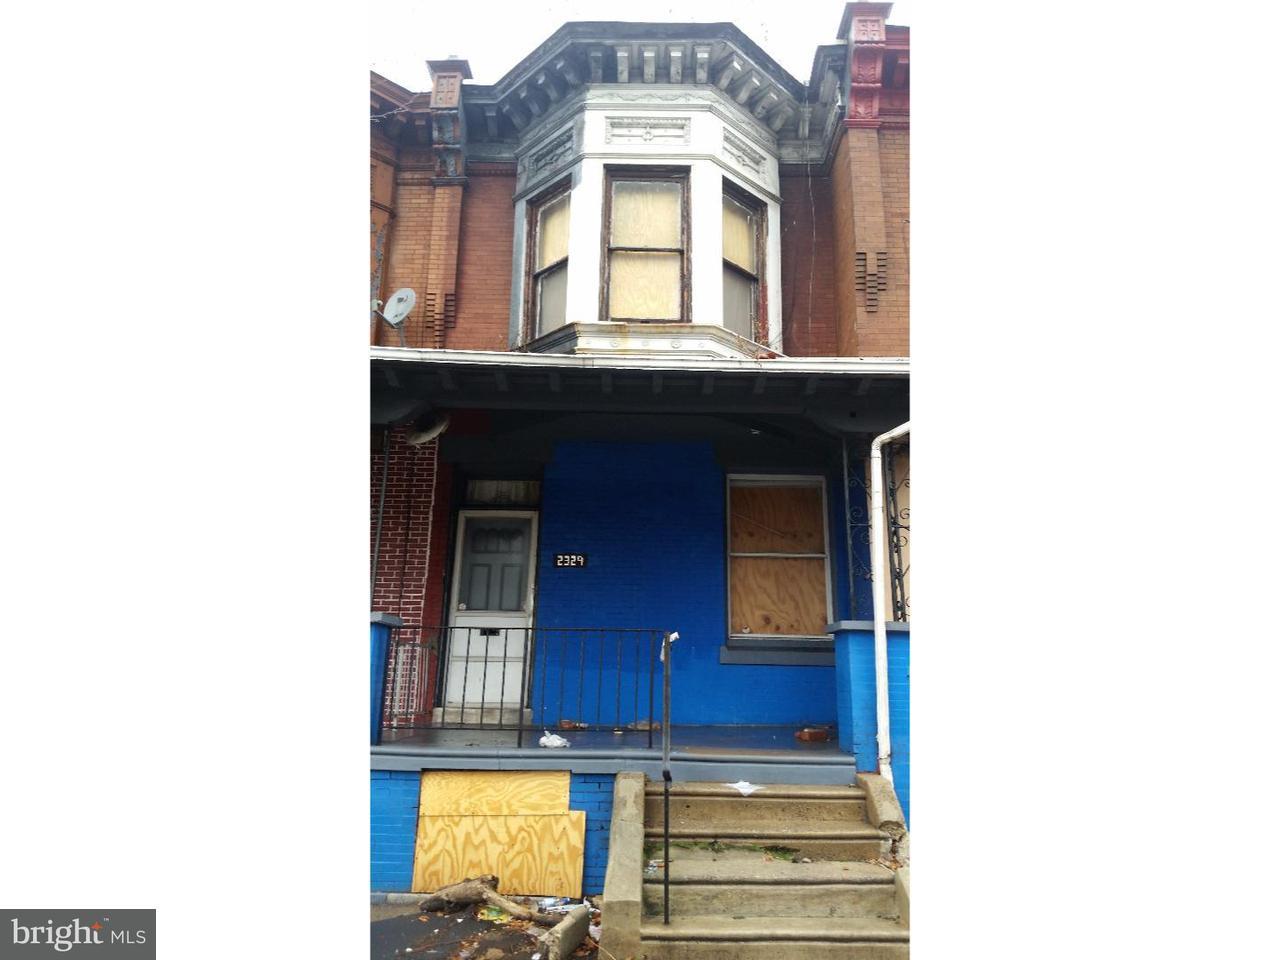 2329 W Lehigh Philadelphia, PA 19132